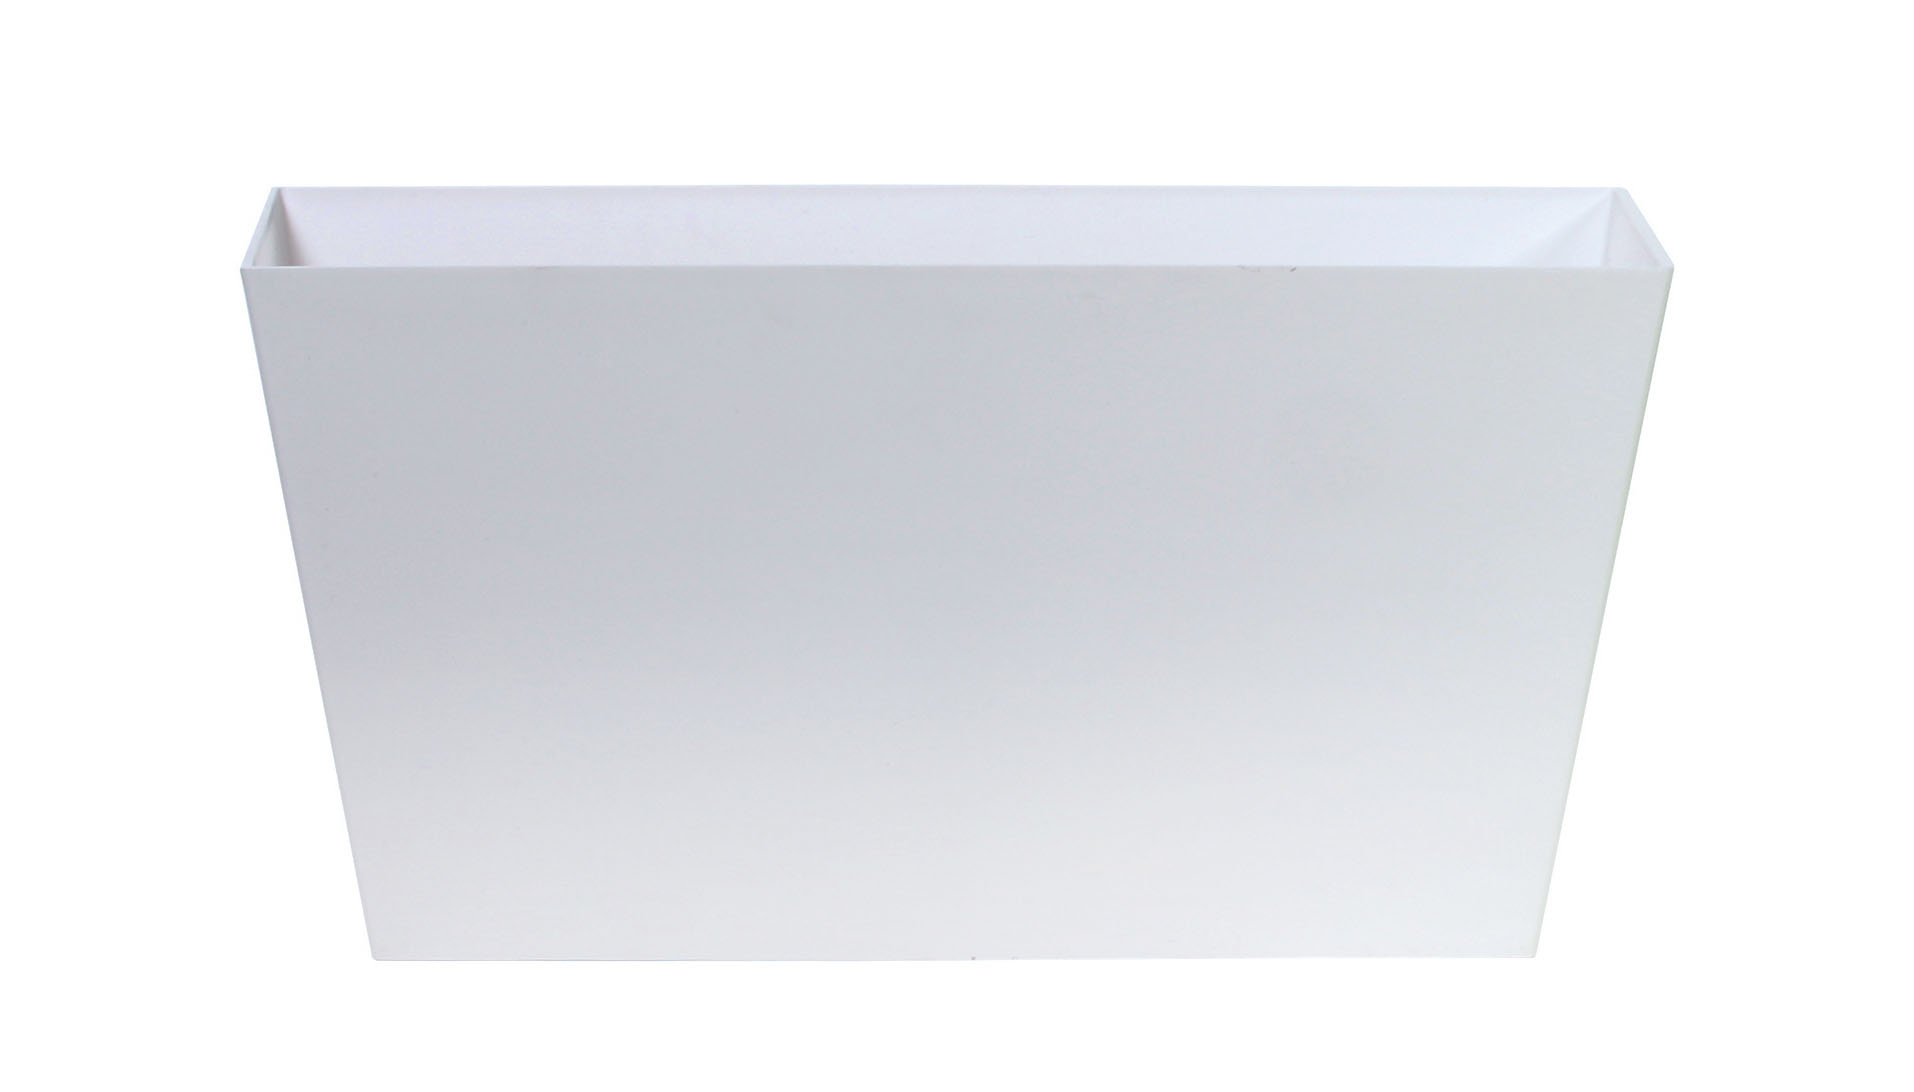 PROSPERPLAST Truhlík TUBUS CASE bílý 40,0cm